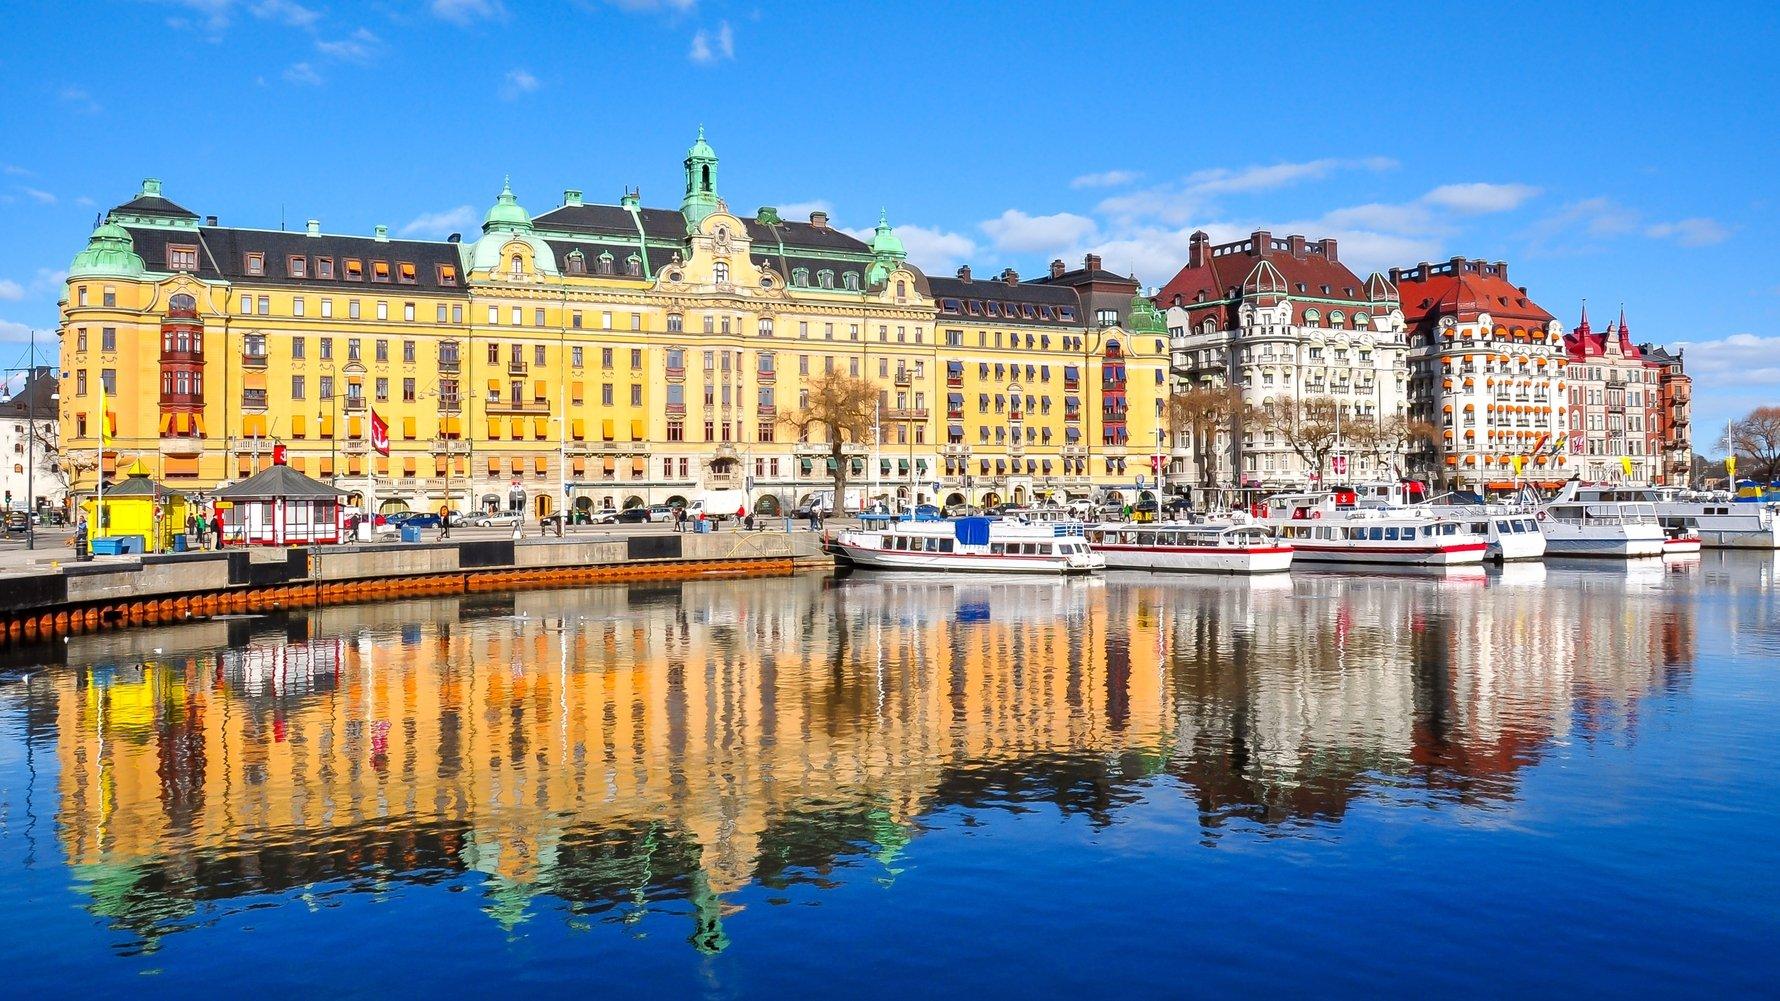 © Mistervlad Shutterstock.com Buildings on Strandvagen embankment, Stockholm, Sweden